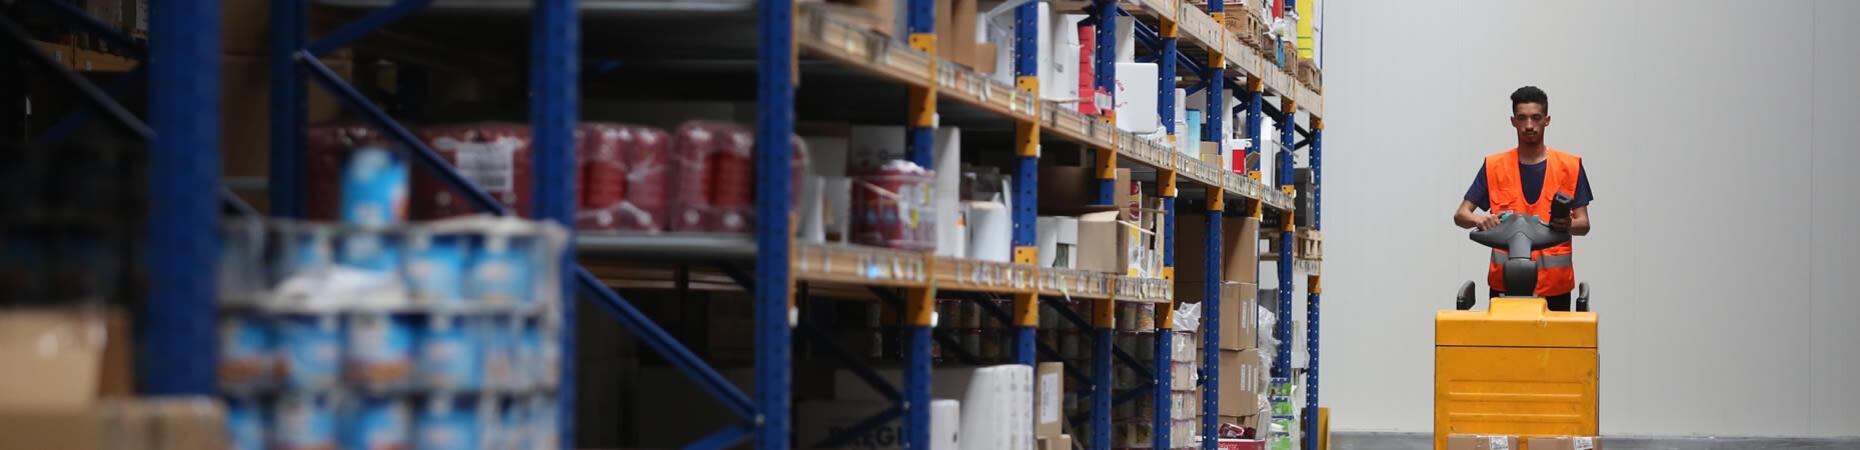 ecoservice-ravenna it logistica-settore-alimentare-ravenna 005